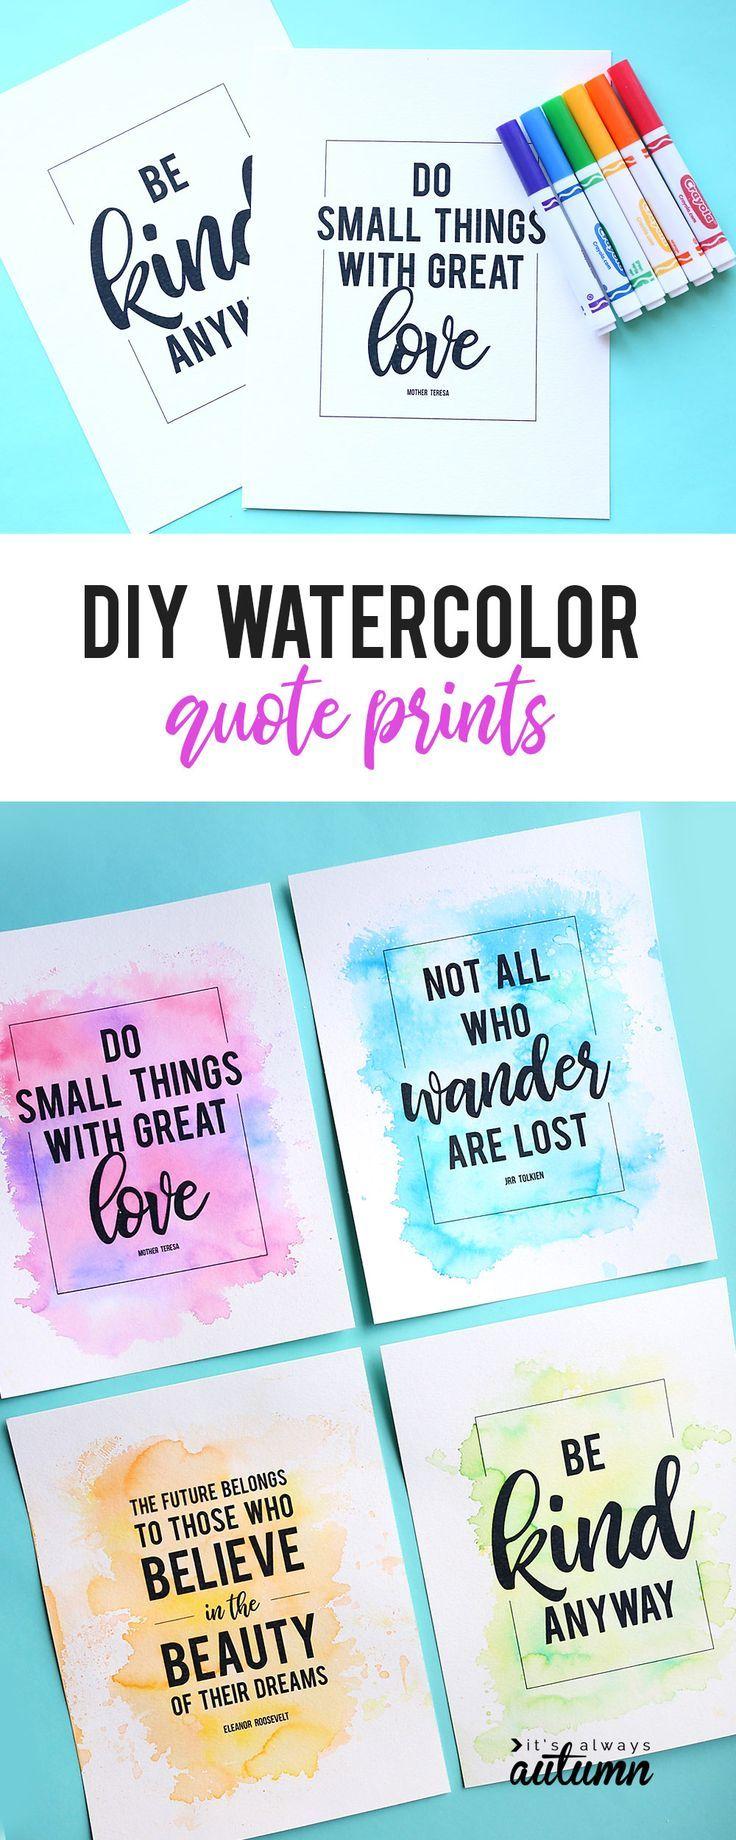 Watercolor Phrase Art Diy Watercolor Art Diy Diy Wall Art Diy Wall